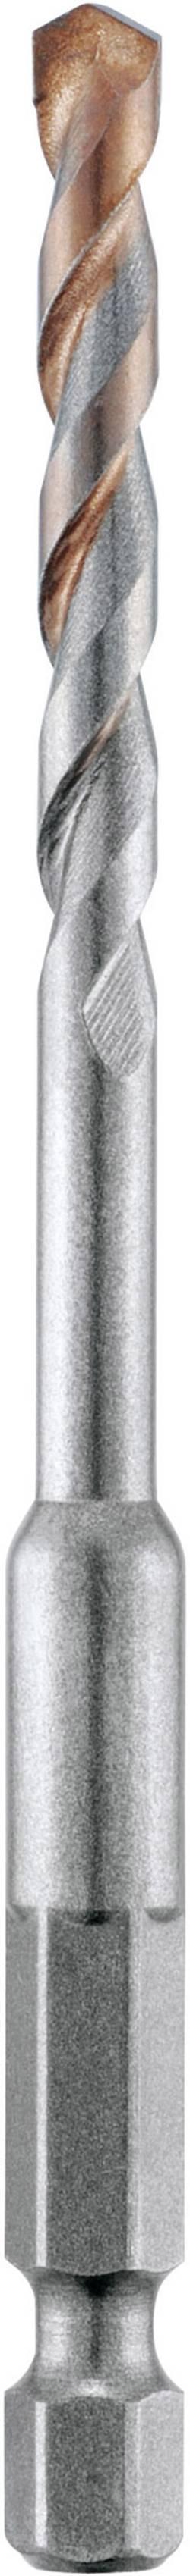 Image of Dachziegelbohrer 3.5 mm Alpen 25200350100 Gesamtlänge 100 mm 1/4 (6.3 mm) 1 St.